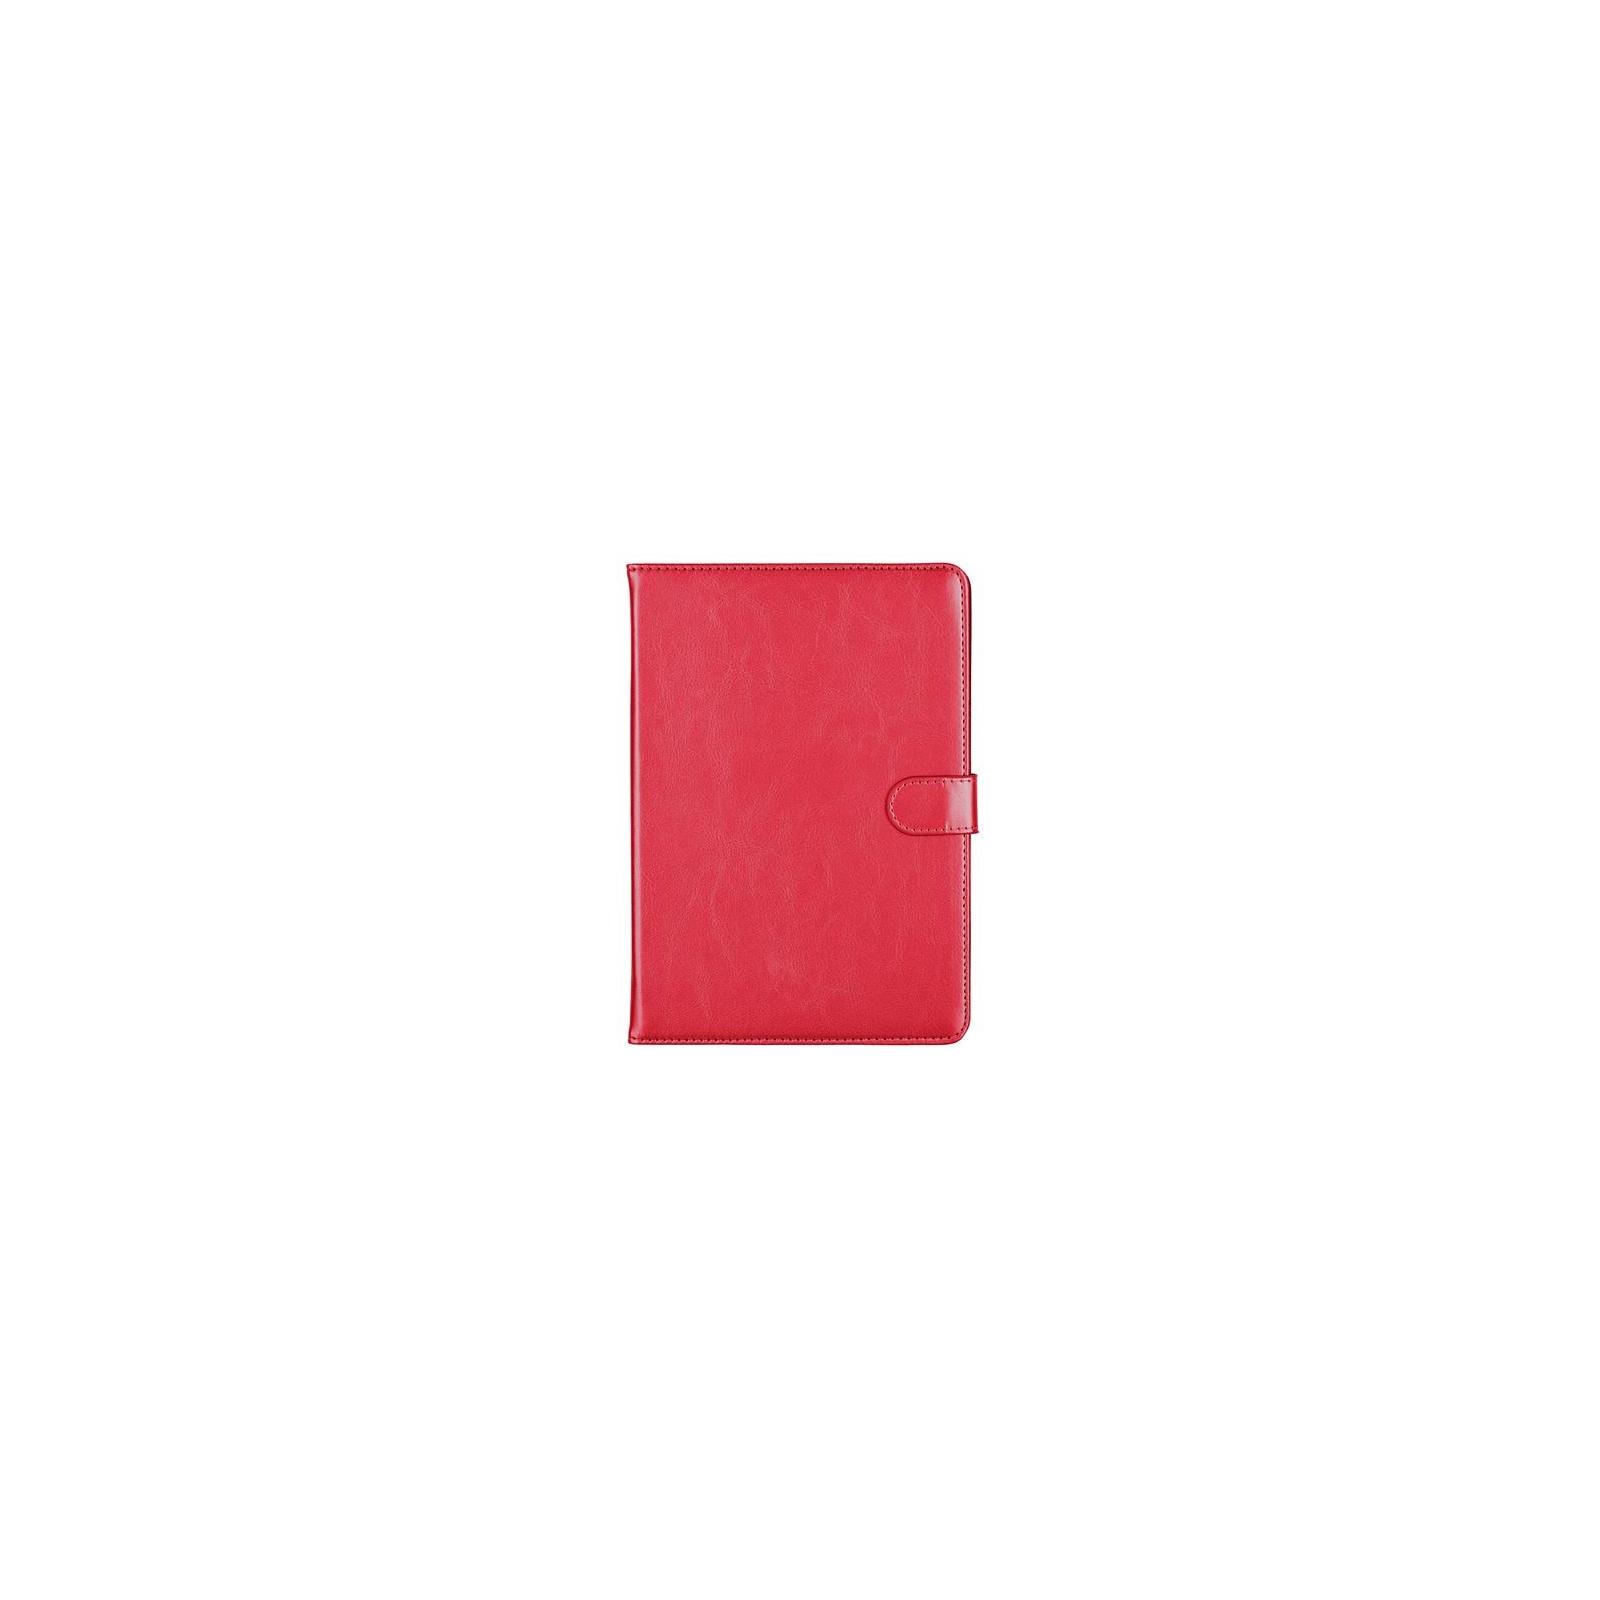 "Чехол для планшета 2E Basic Universal 9-10"", Deep Red (2E-UNI-9-10-OC-RD)"